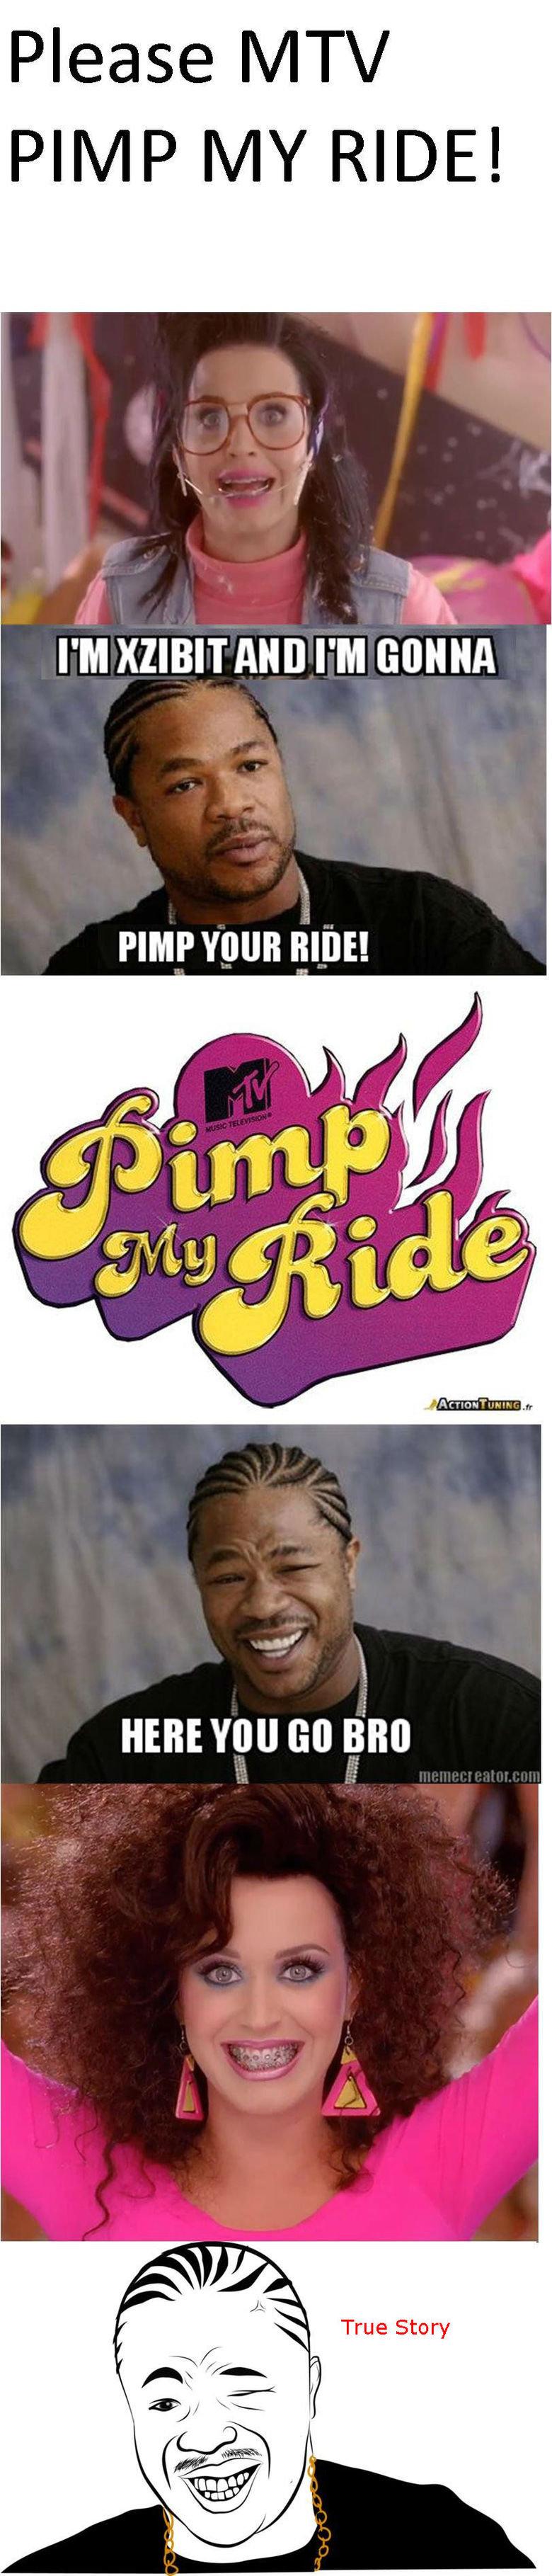 Pimp My Ride. My crappy OC. PIMP MY RIDE! PIMP mun Ignaz! no lik Pimp my ride